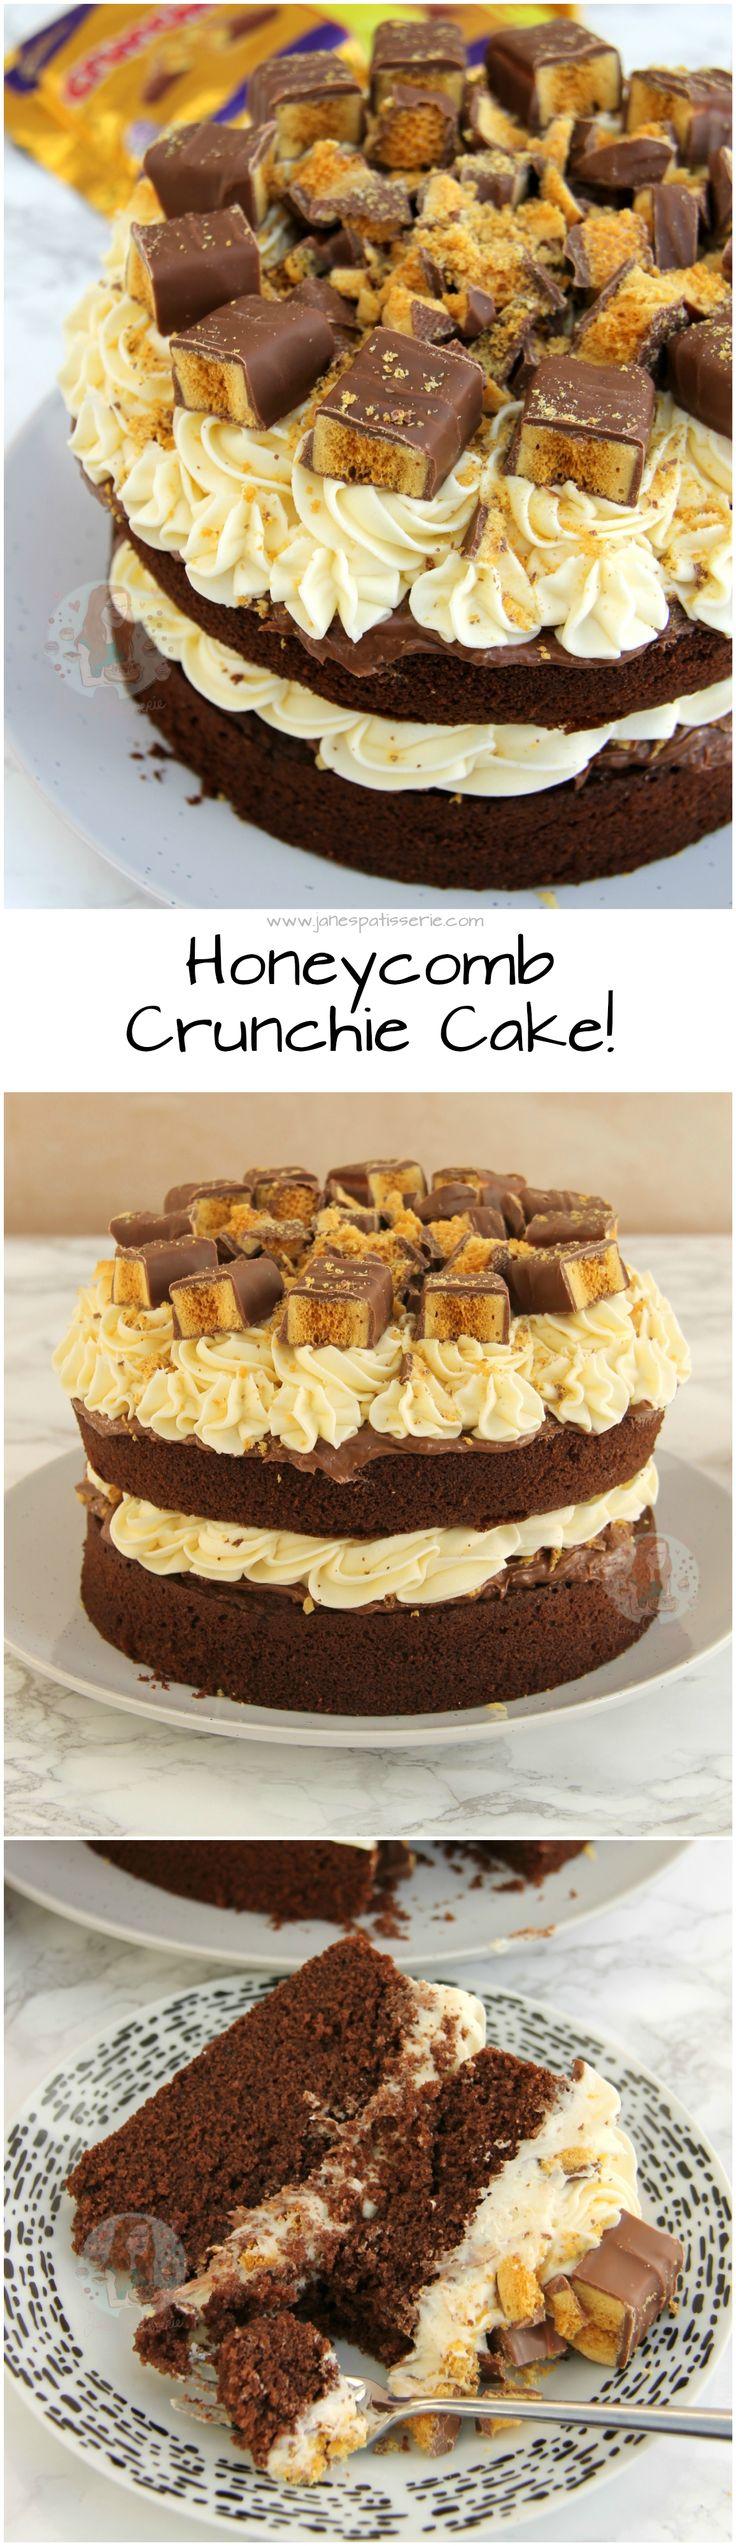 Honeycomb Crunchie Cake!! ❤️ Chocolate Sponge, Crunchie Spread, Honey Buttercream Frosting & Crunchies!